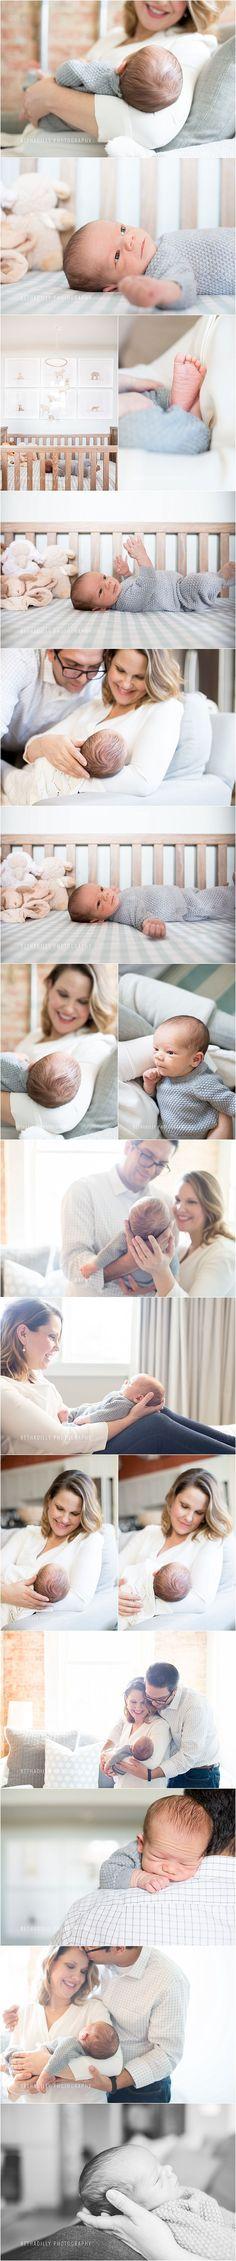 The First 17 Days | Washington DC Newborn Baby Photographer | Bethadilly Photography